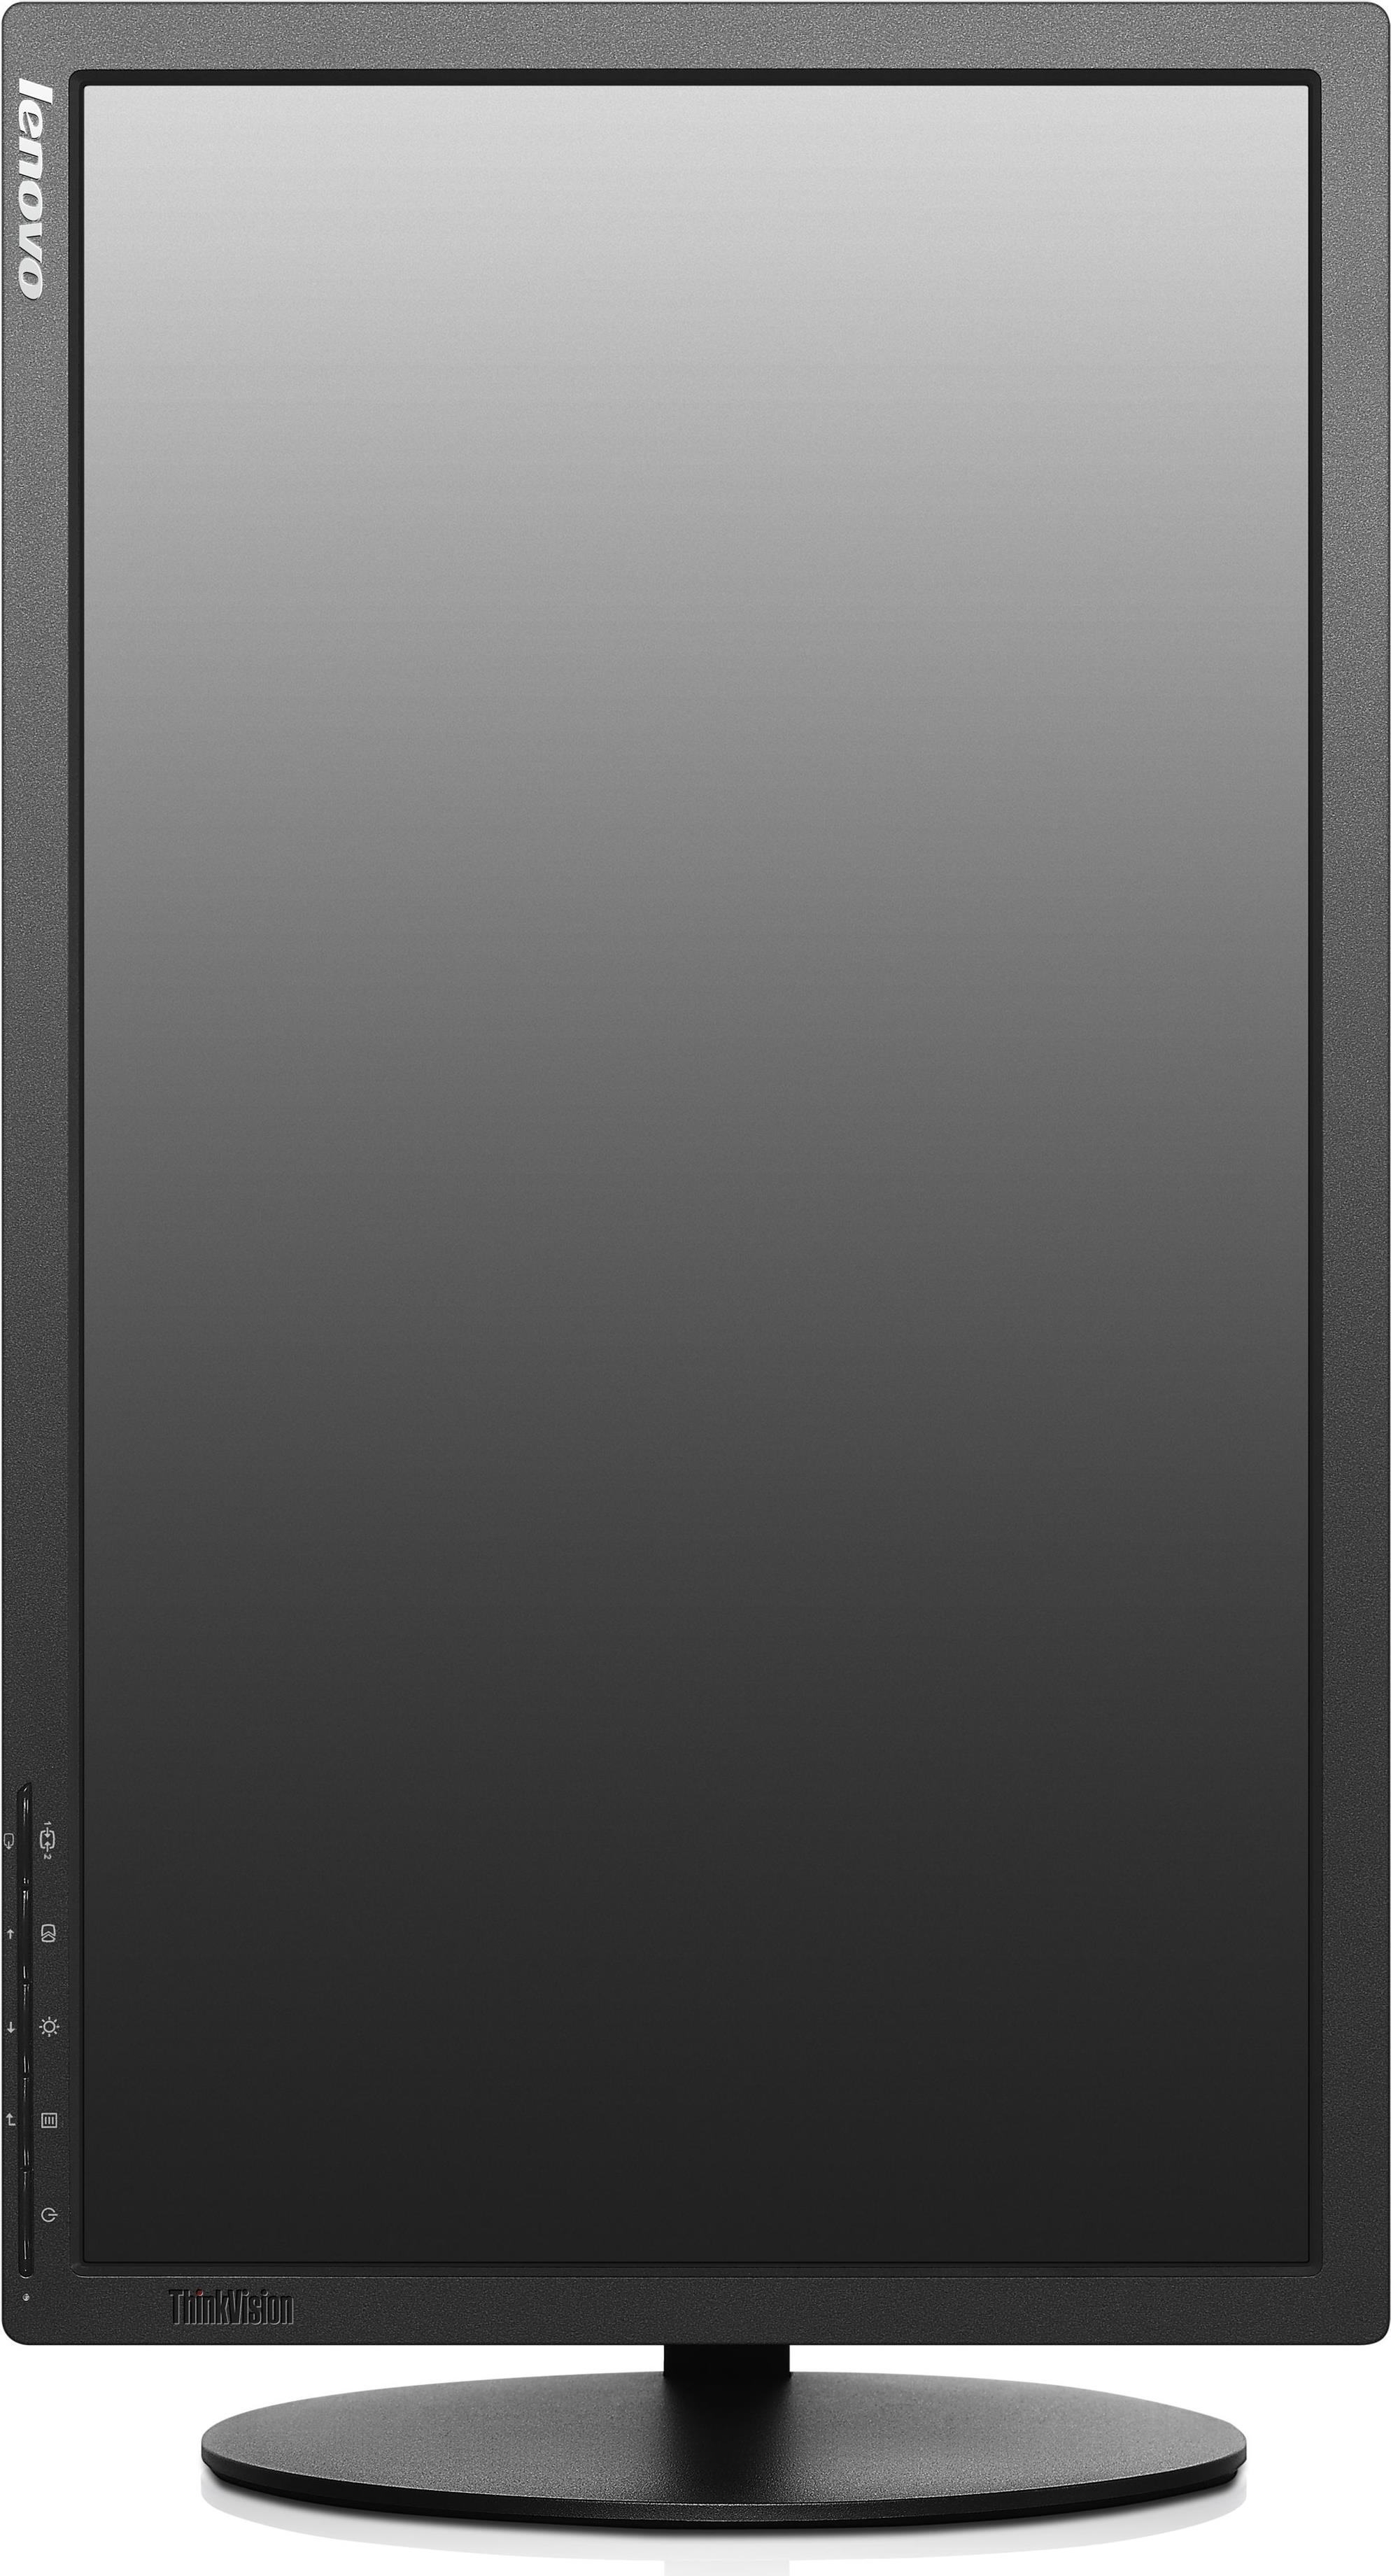 Lenovo ThinkVision T2254p - LED-Monitor - 55.9 cm (22) (22 sichtbar) - 1680 x 1050 - TN - 250 cd/m² - 1000:1 - 5 ms - HDMI, VGA, DisplayPort - Raven Black